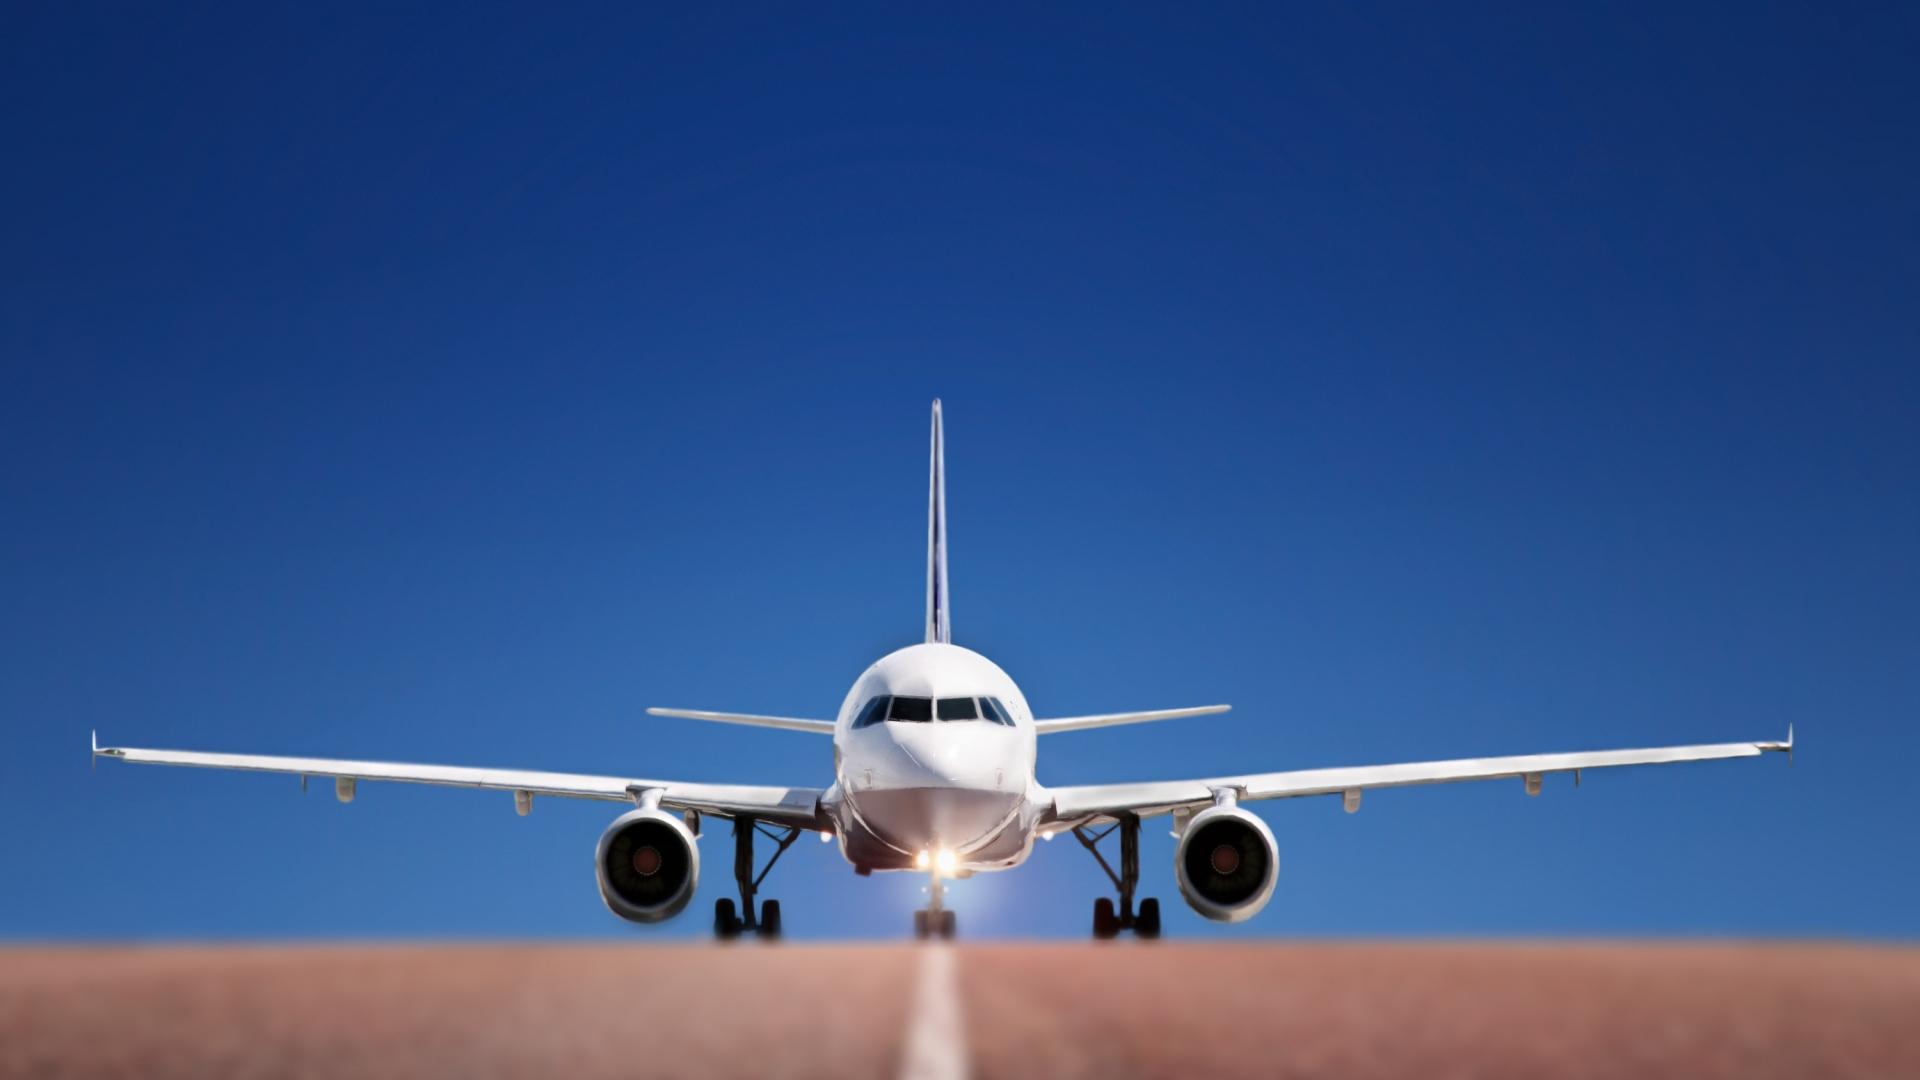 airplane take off airplane take off 1920x1080